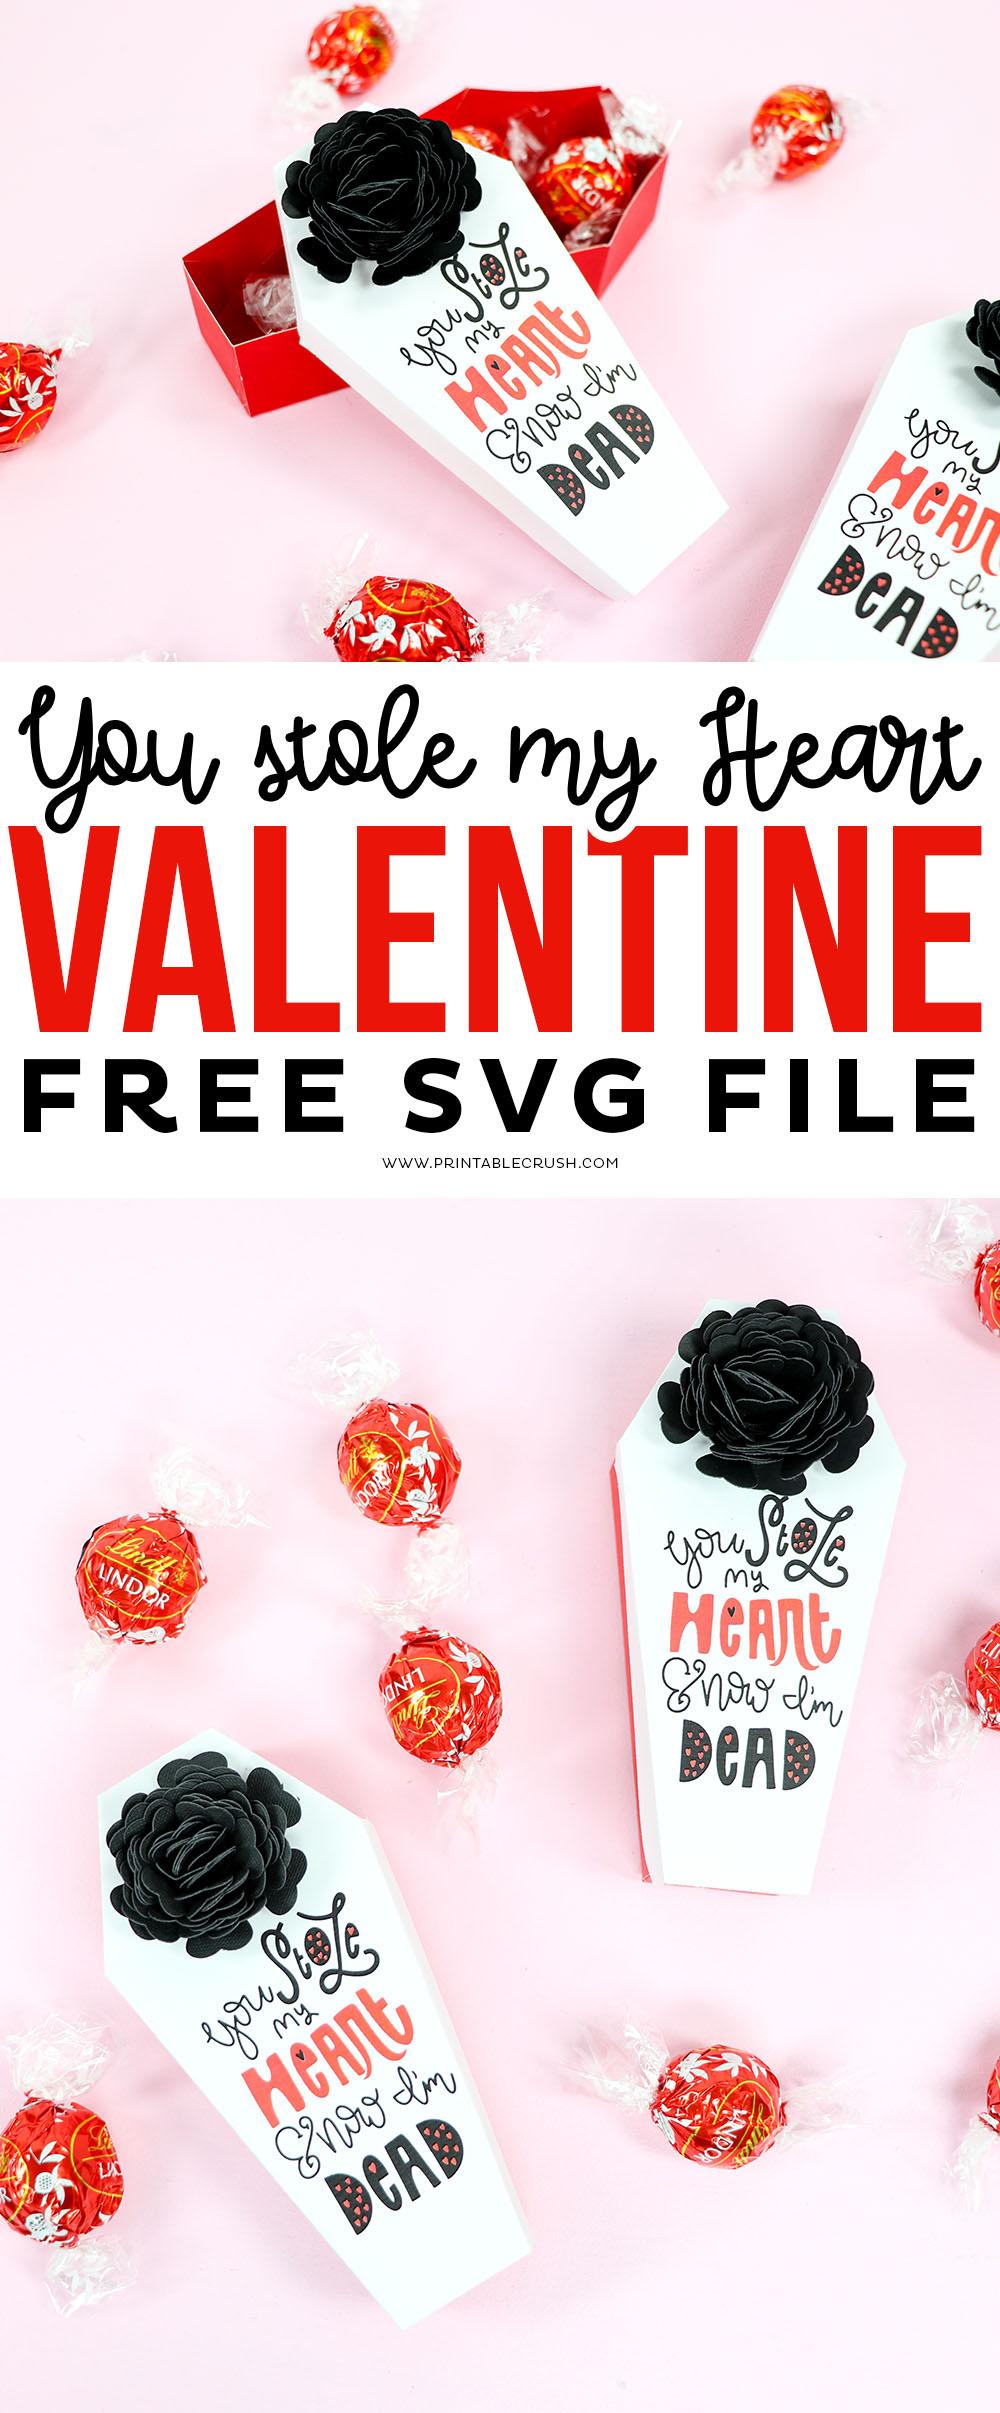 You Stole My Heart and Now I'm Dead Valentine Free SVG File #freesvgfile #valentinesday #valentinecraft #svgfiles #cricutcrafts via @printablecrush